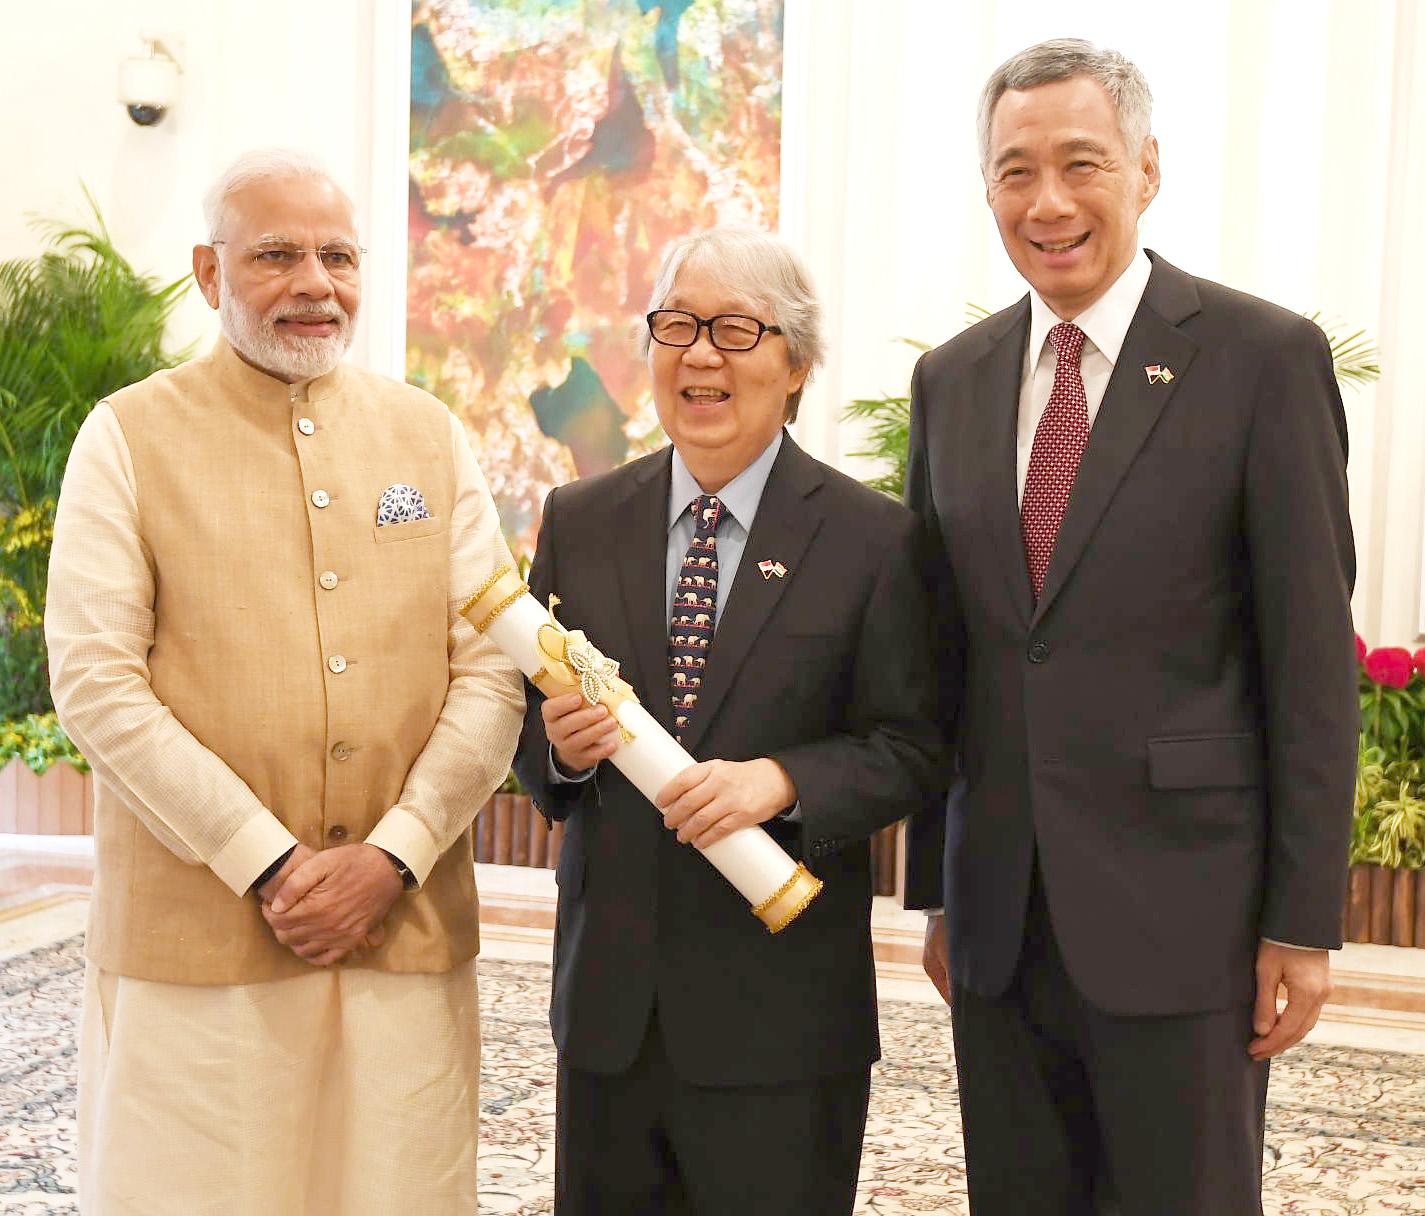 The_Prime_Minister%2C_Shri_Narendra_Modi_handing_over_the_Padma_Shri_Award_to_veteran_Singaporean_diplomat_Tommy_Koh%2C_at_Istana_-_Presidential_Palace%2C_in_Singapore.JPG